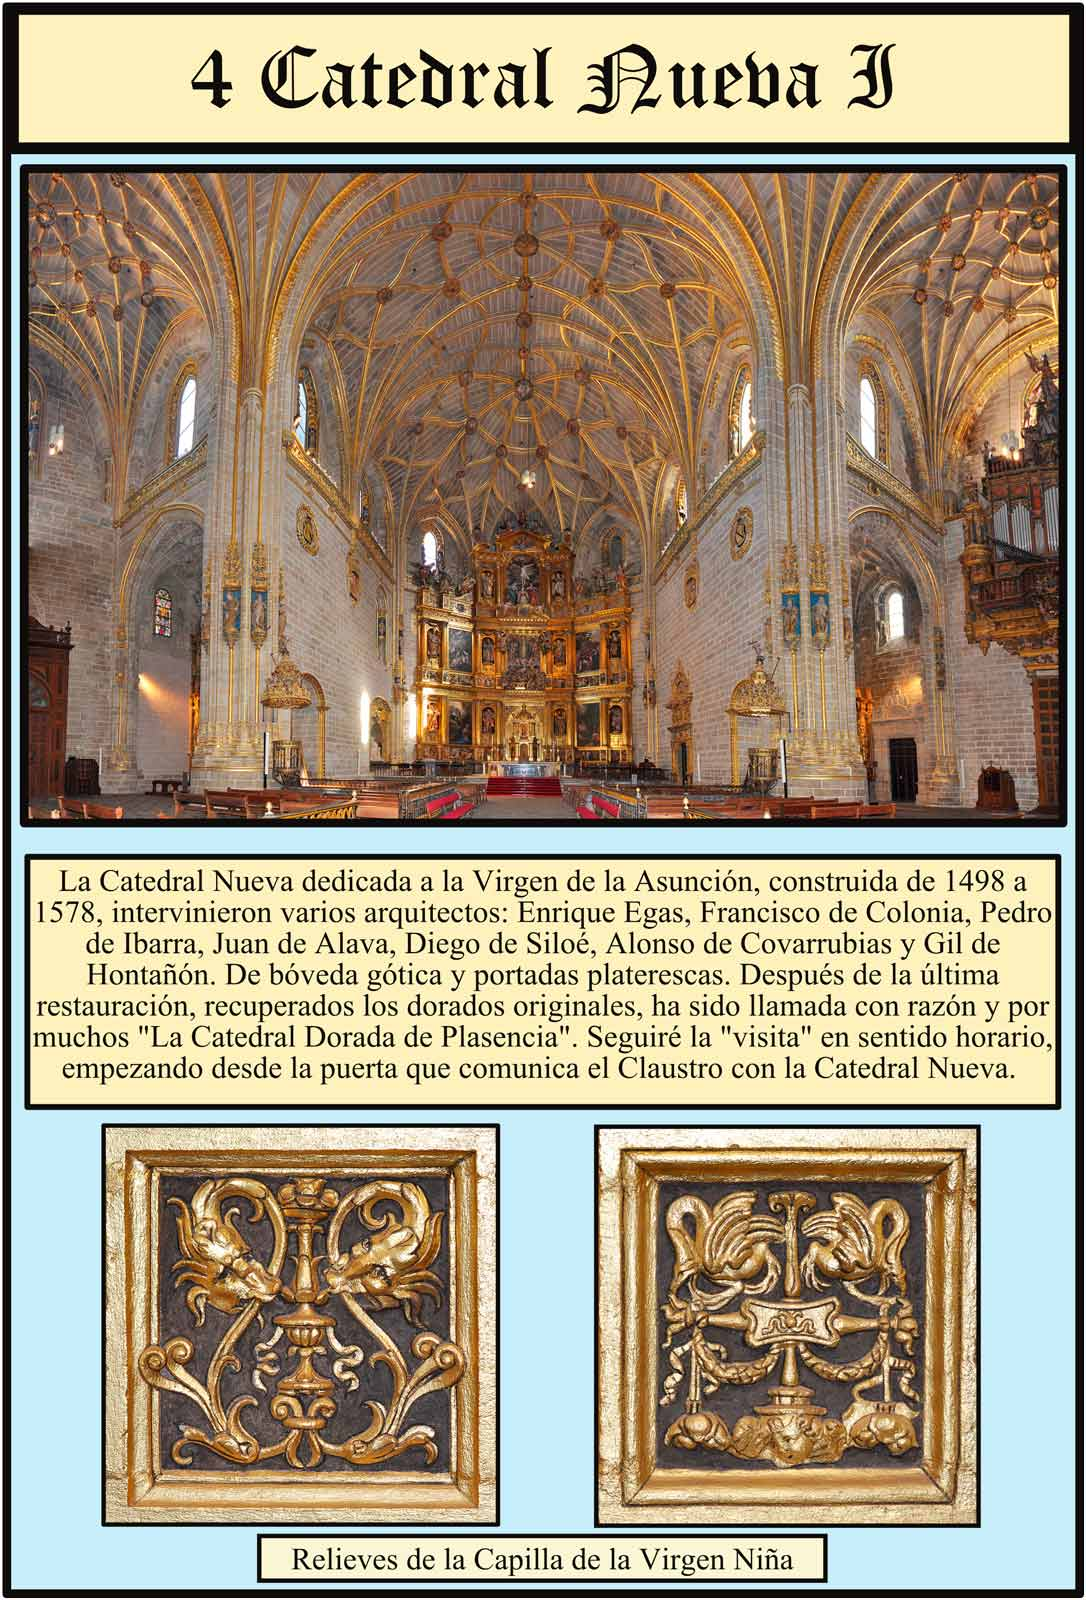 Catedral Nueva Dorada